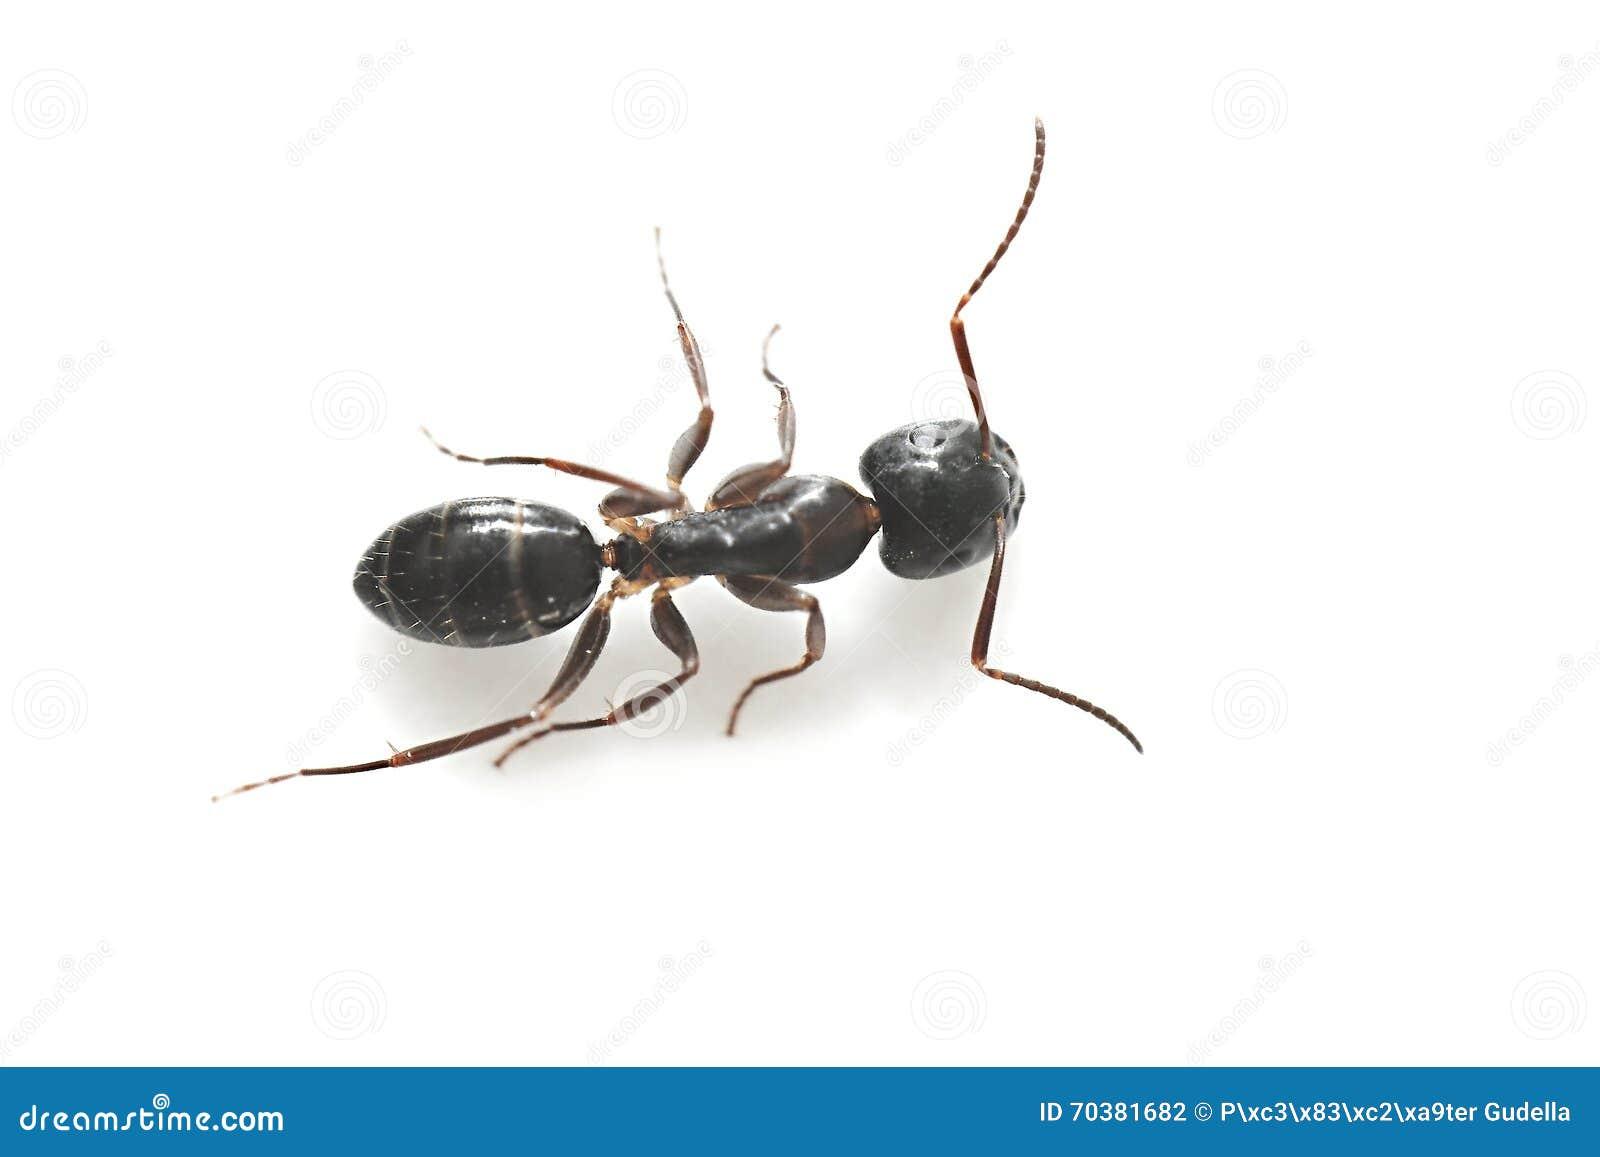 Hormiga negra com n del jard n foto de archivo imagen for Hormigas en el jardin